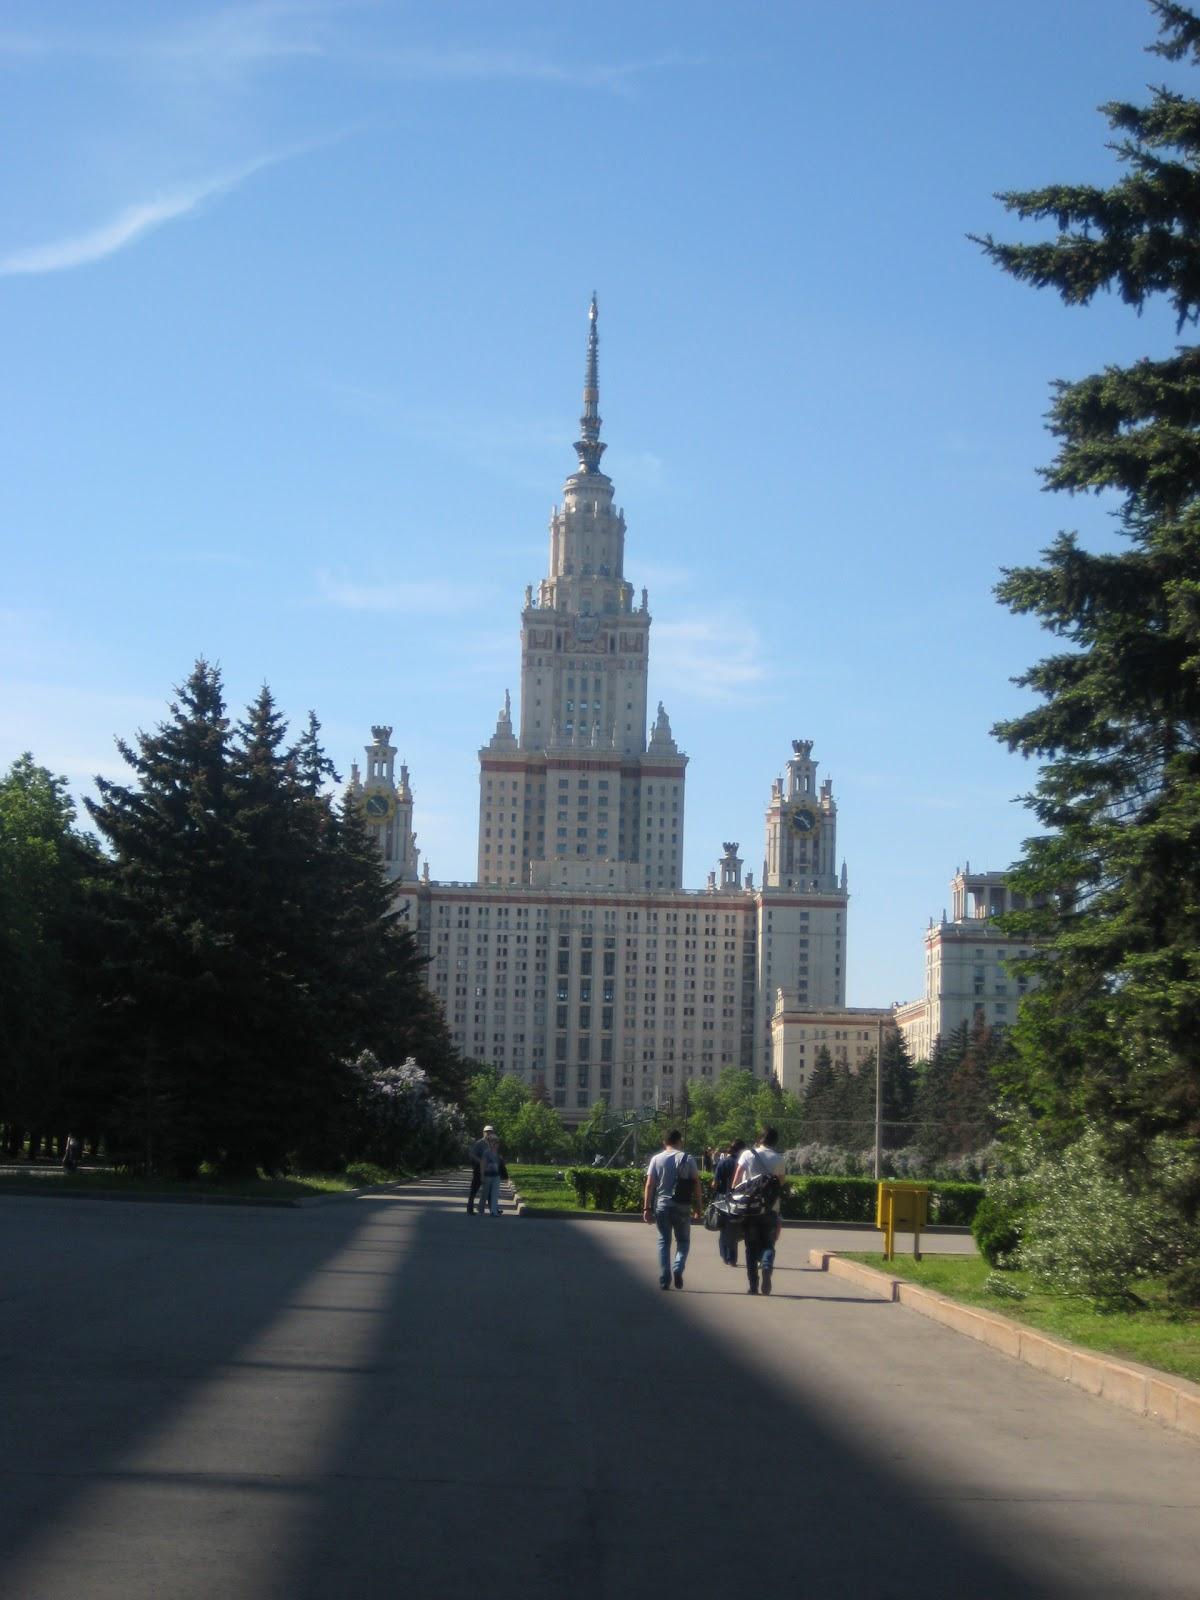 Stalinin Hampaat